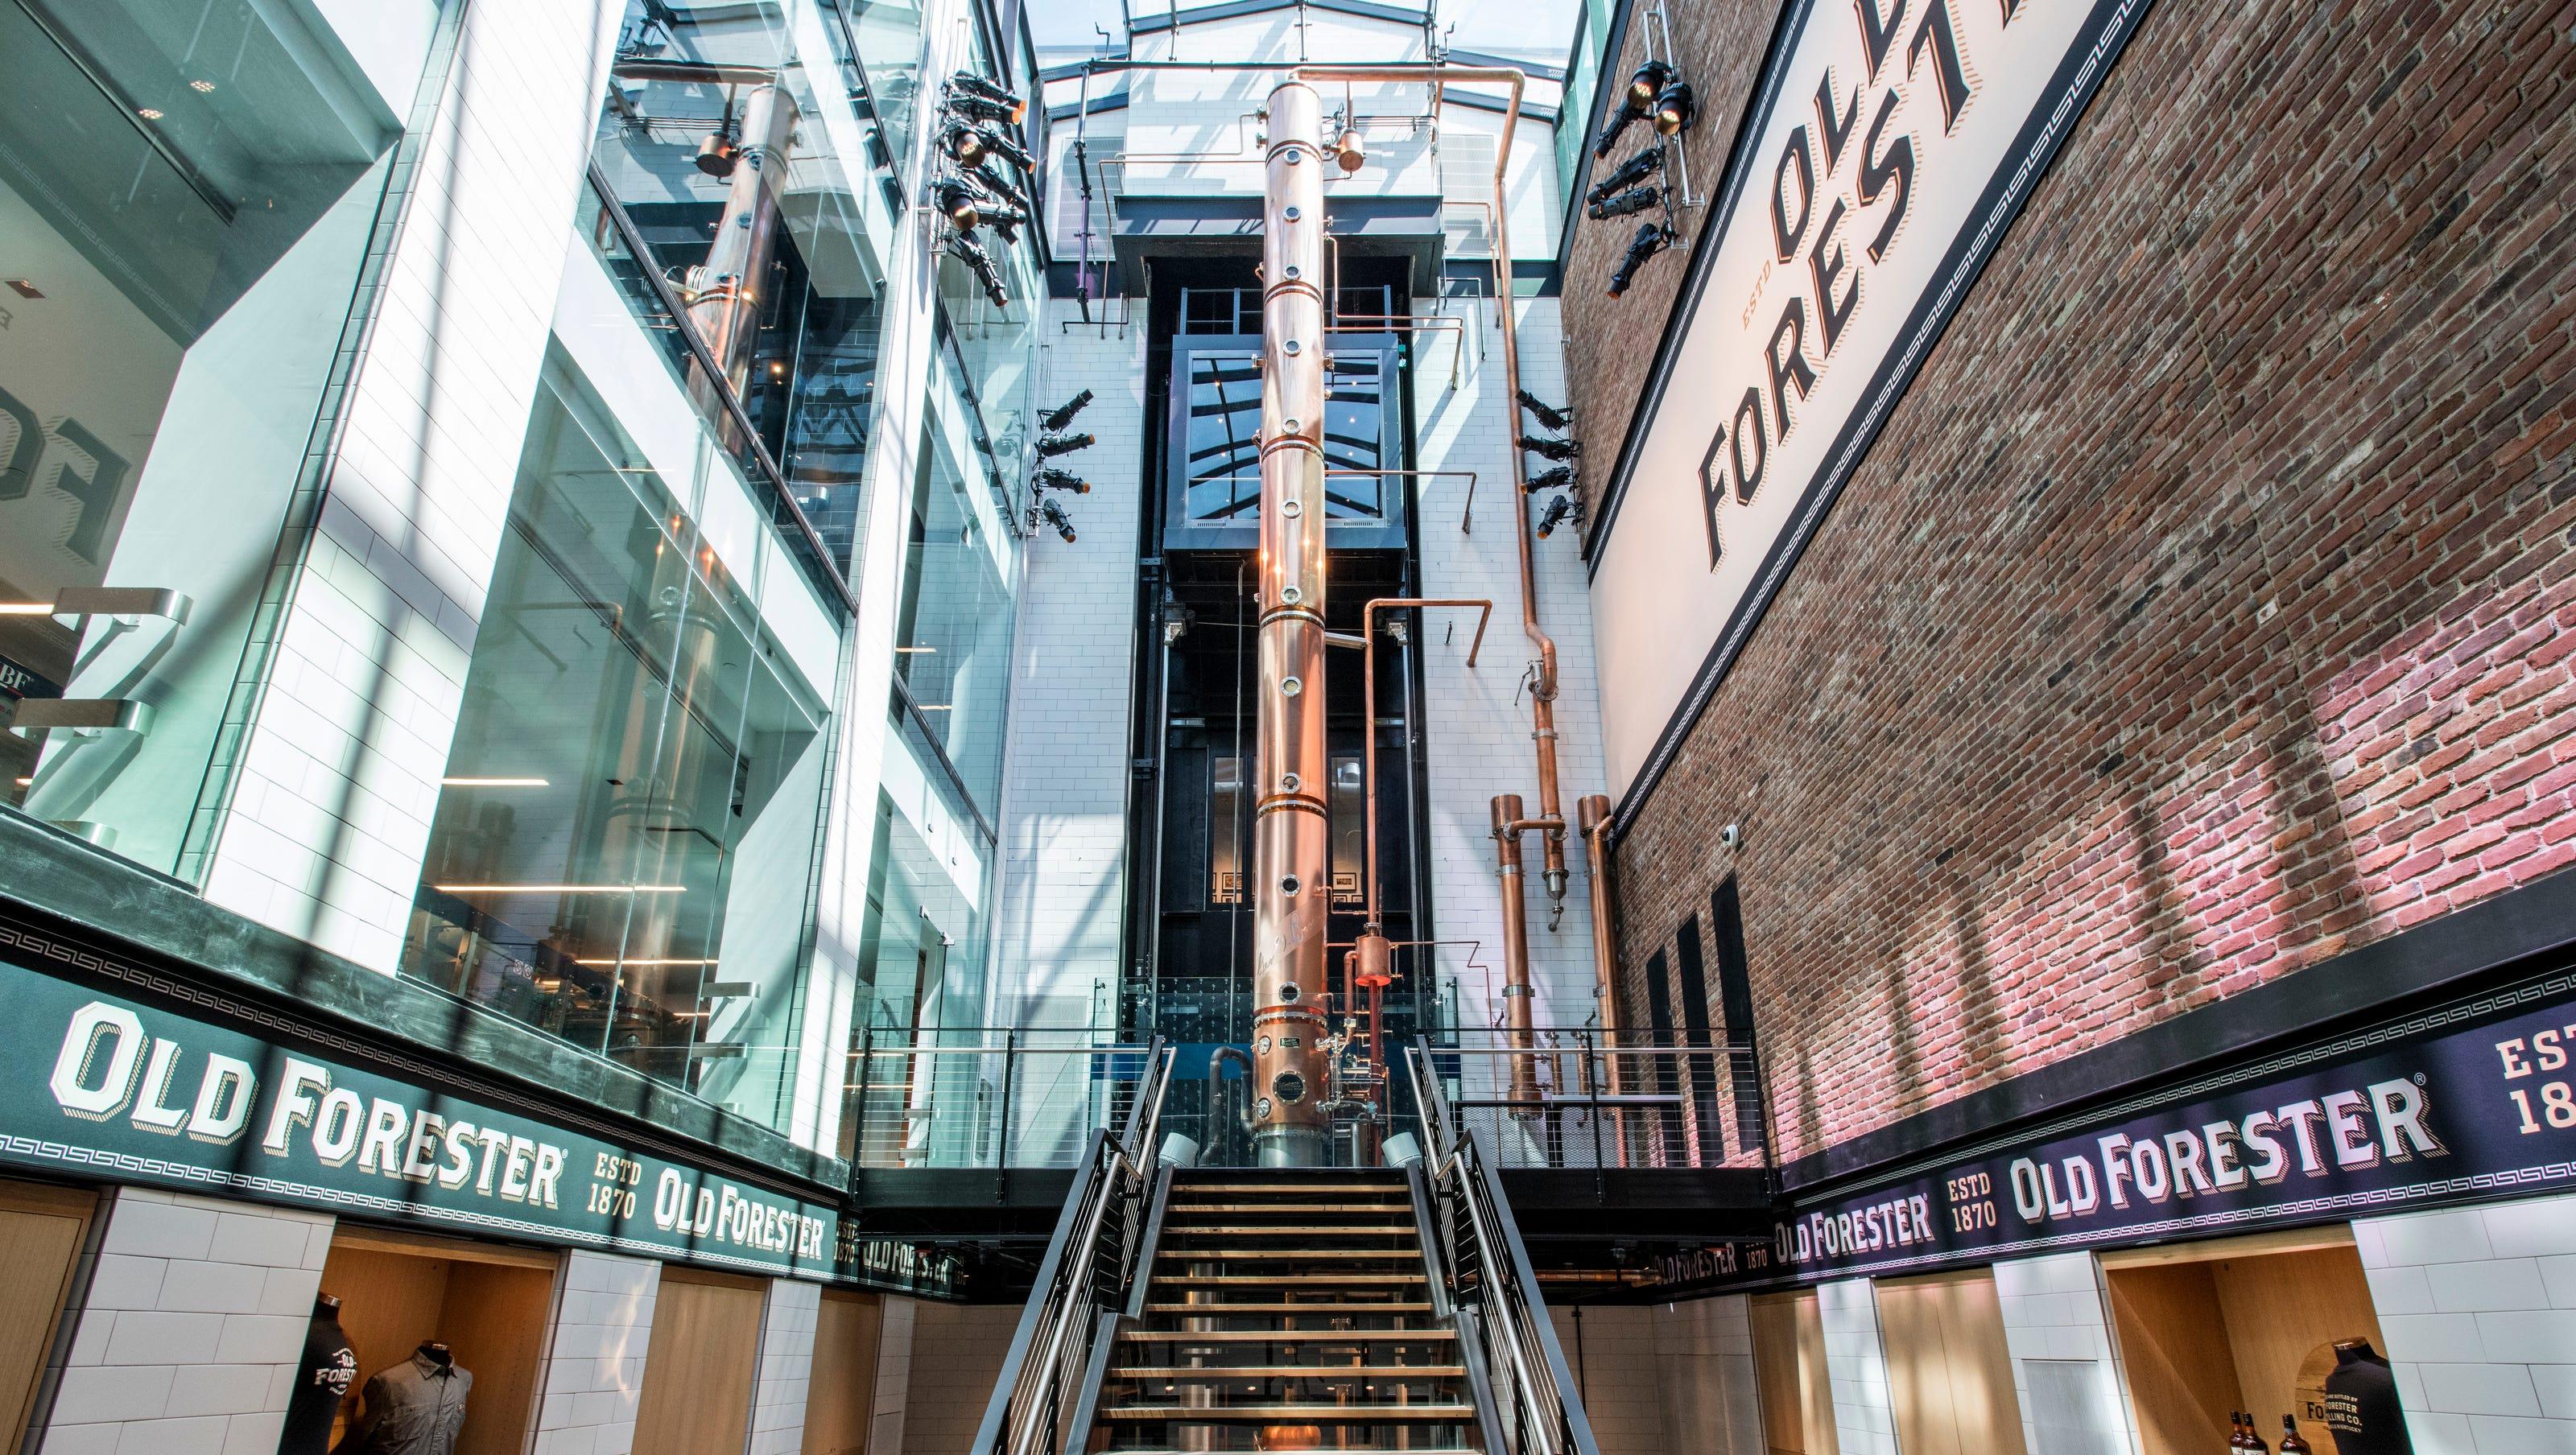 Old Forester Bourbon Whisky Distillery